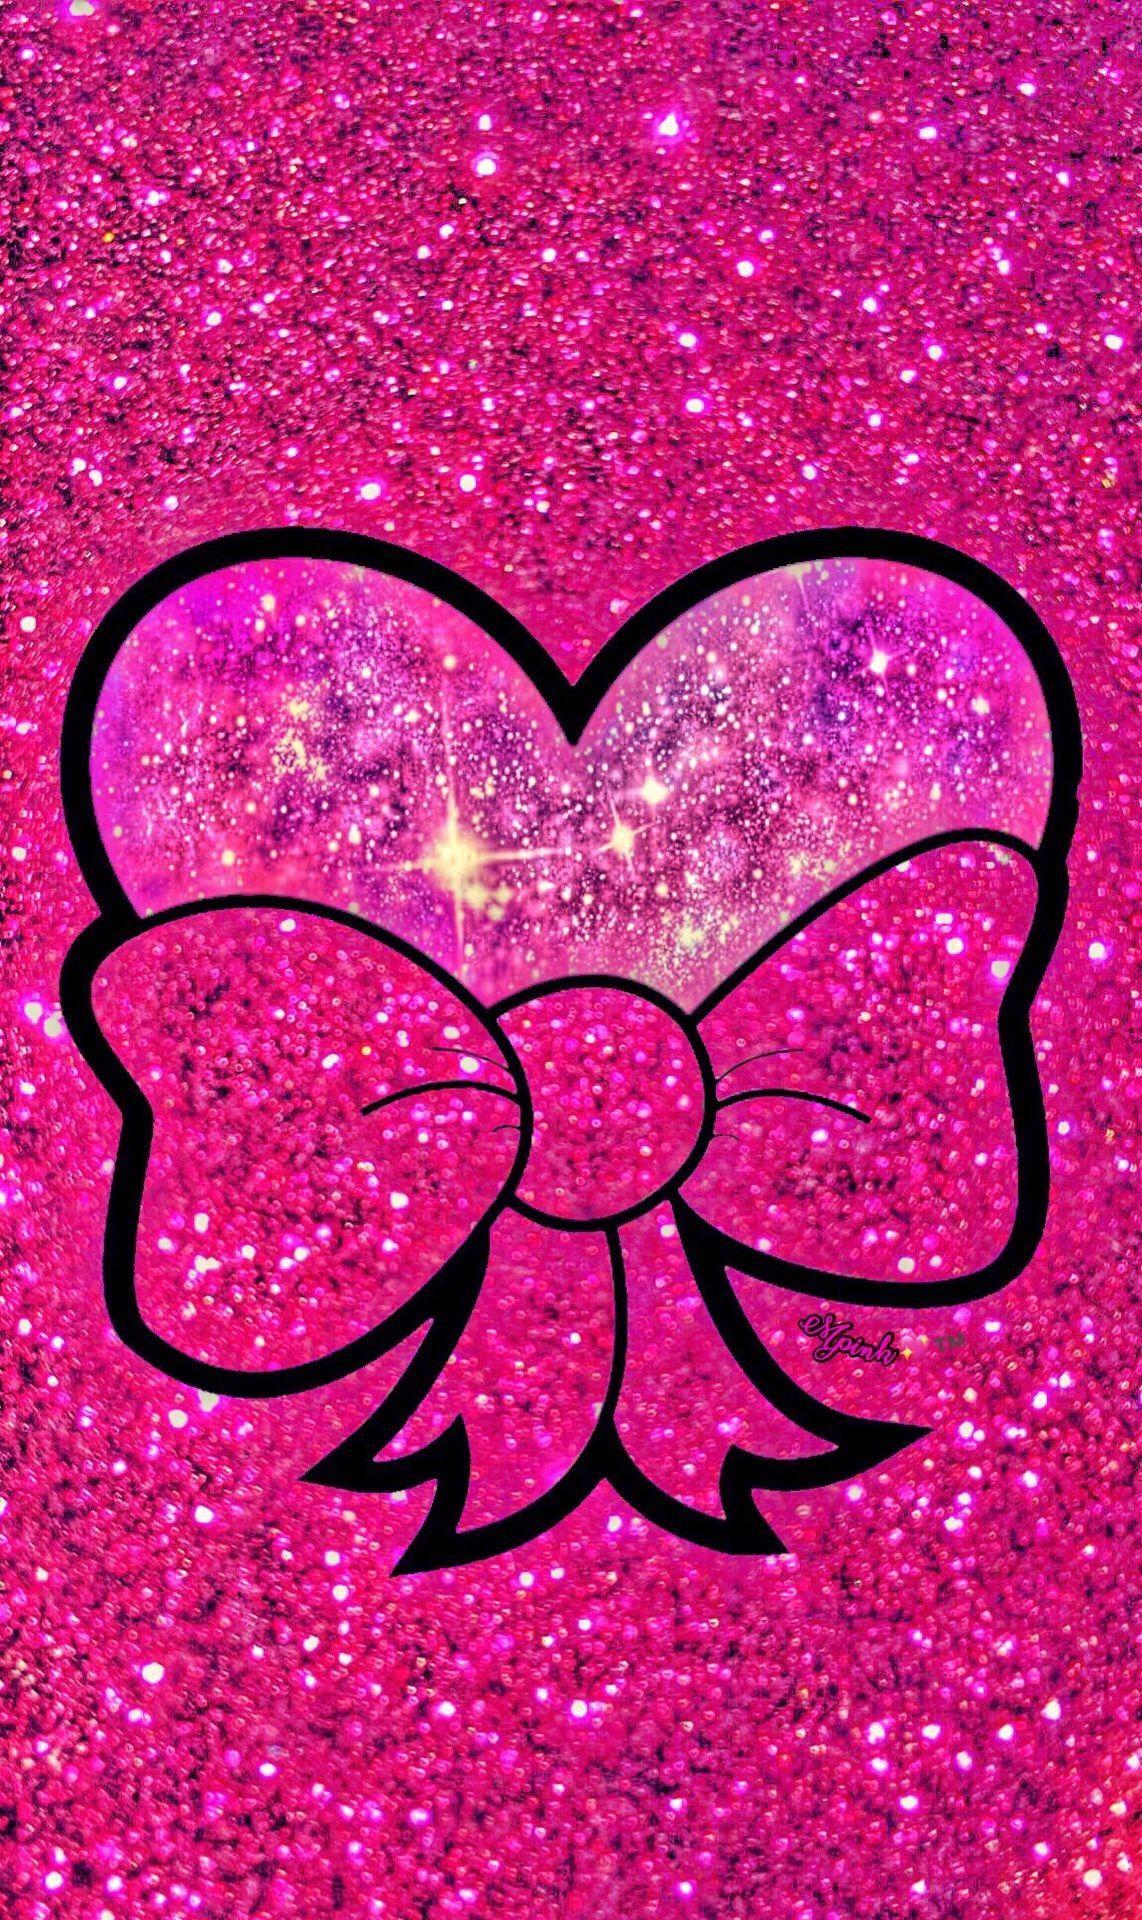 Cute Pink Love Wallpaper Hd in 2020 Iphone wallpaper